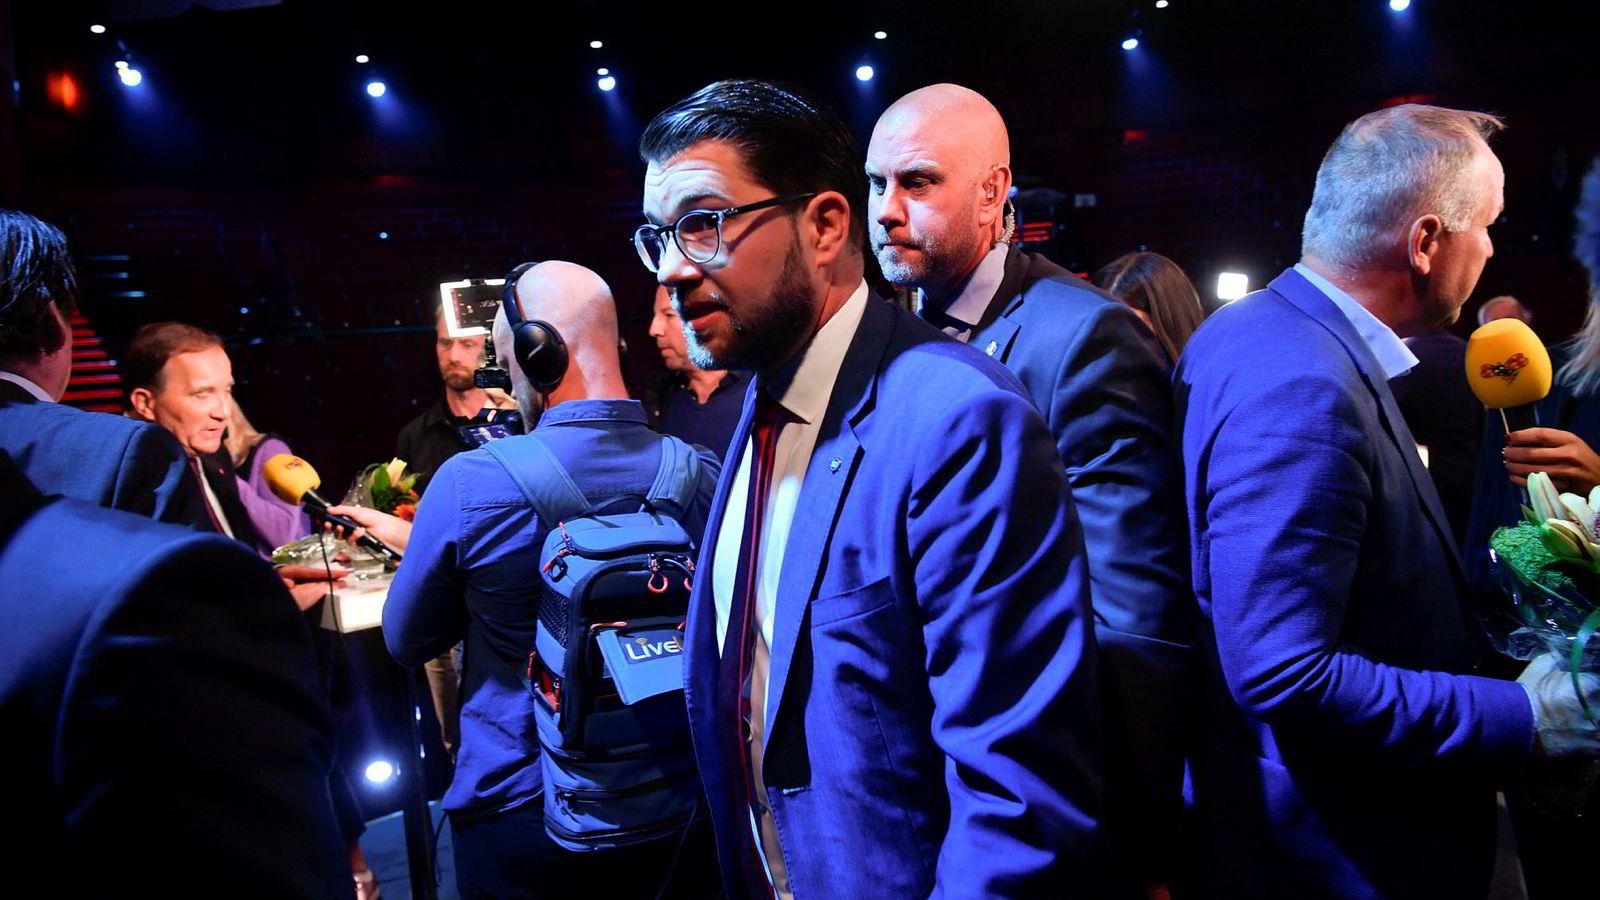 Søndagens valg i Sverige blir spennende. På bildet Sverigedemokraternes leder Jimmie Åkesson ved Aftonbladets partilederdebatt på Cirkus, Skandiascenen i Stockholm.